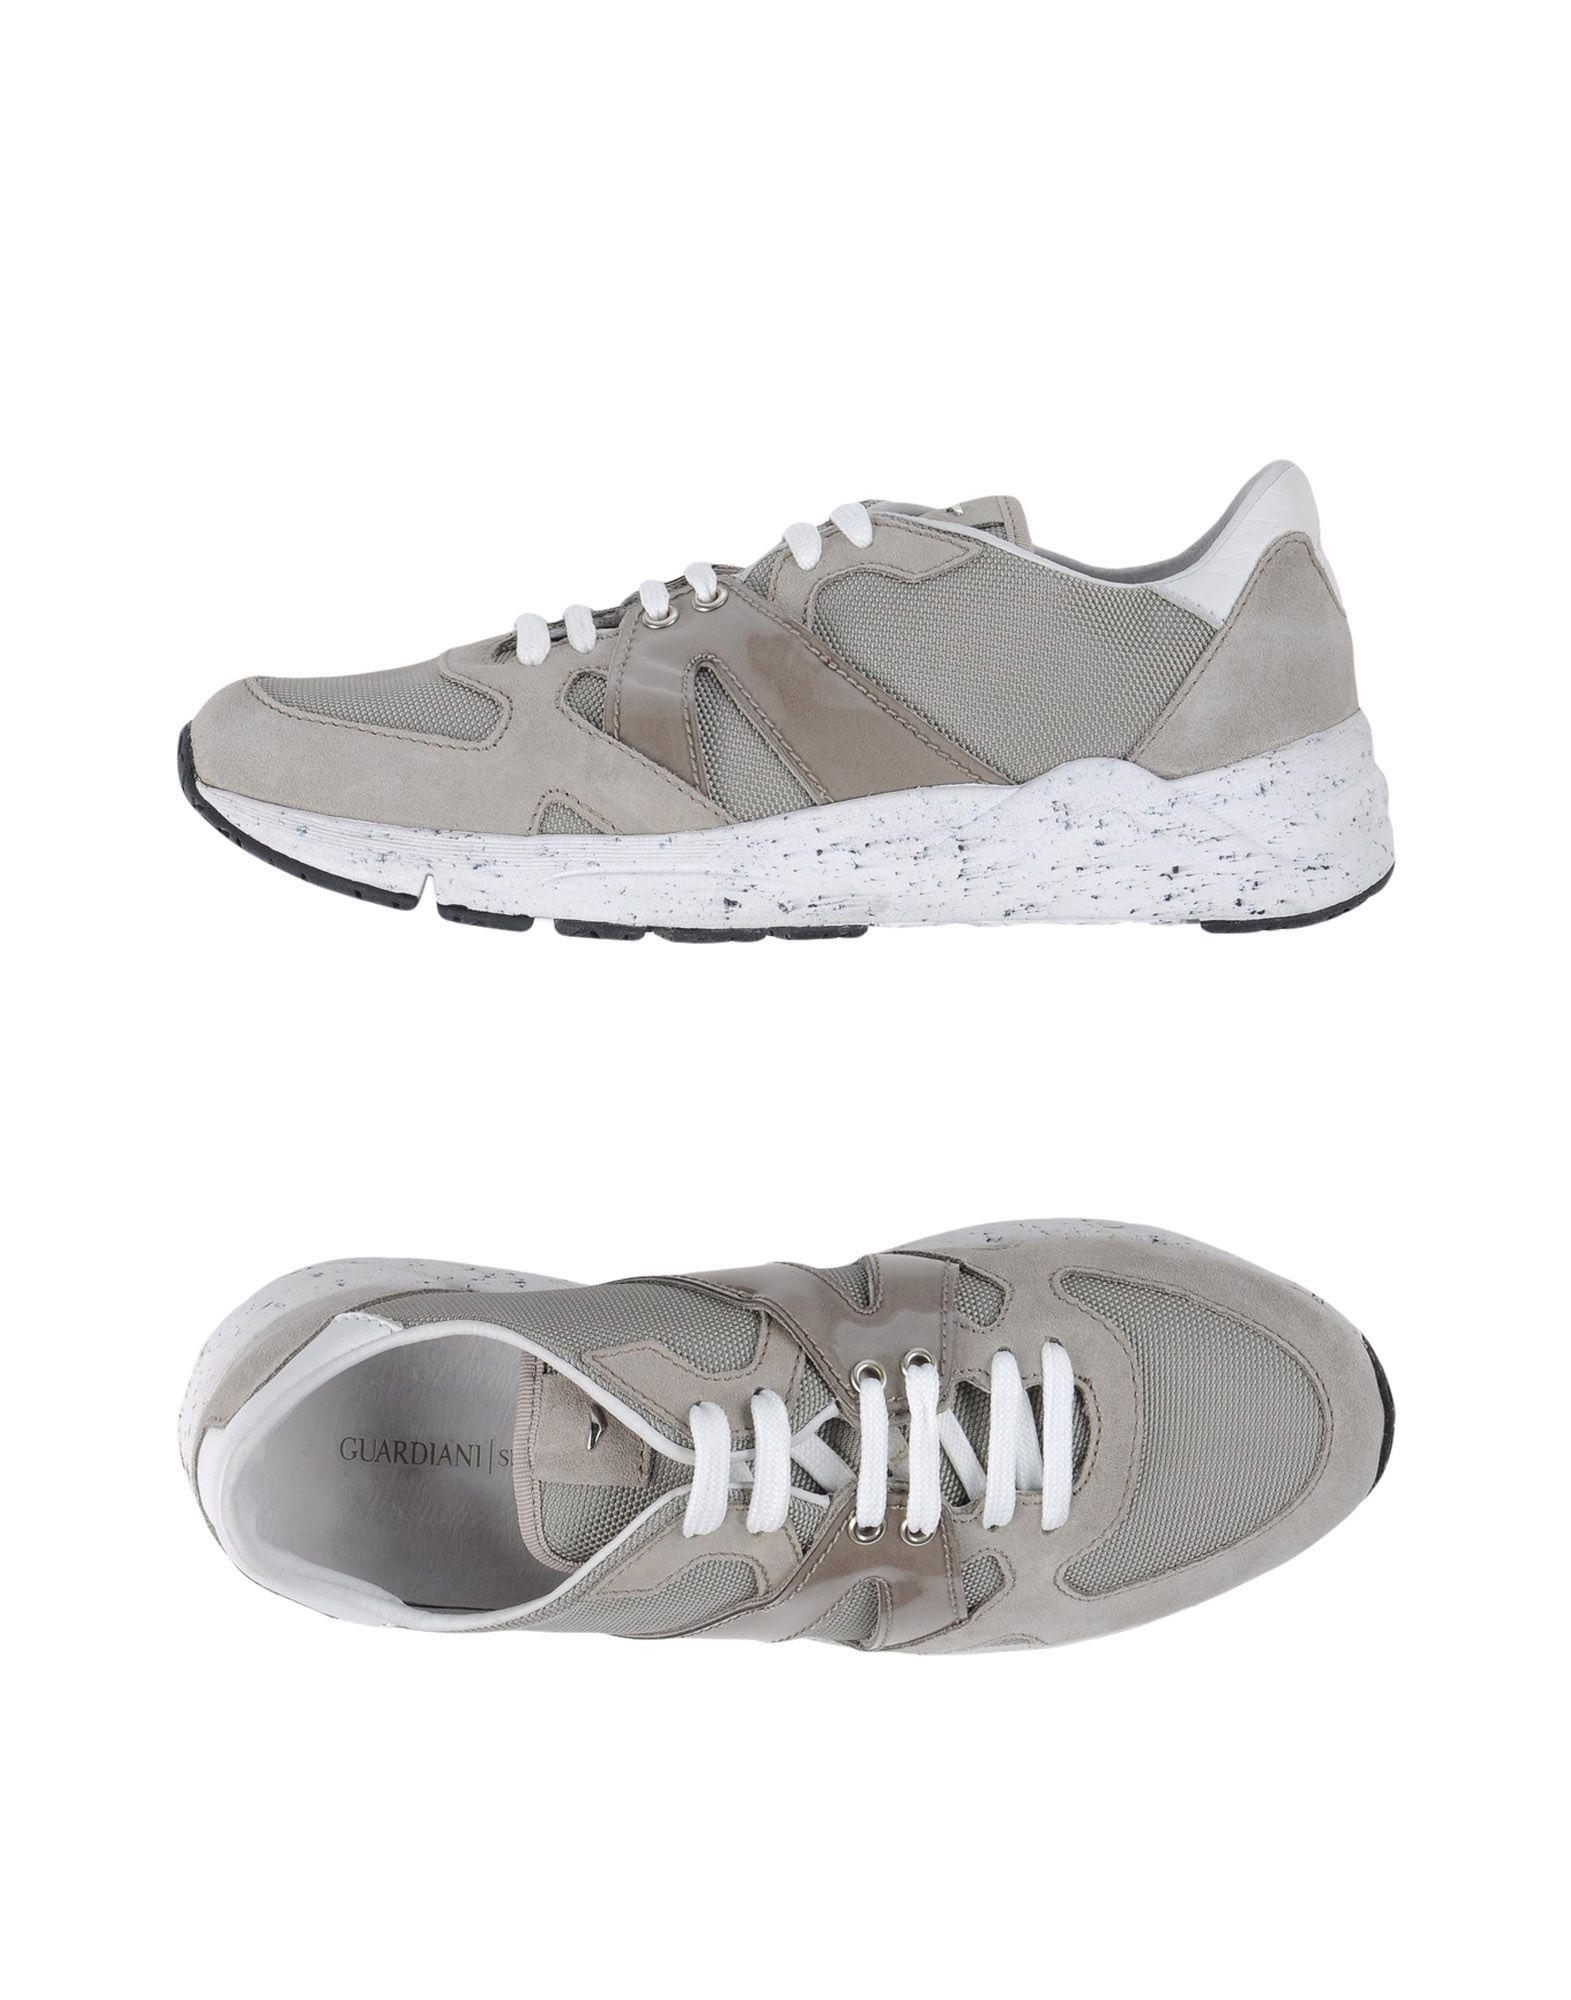 ALBERTO GUARDIANI Herren Low Sneakers & Tennisschuhe Farbe Grau Größe 9 jetztbilligerkaufen